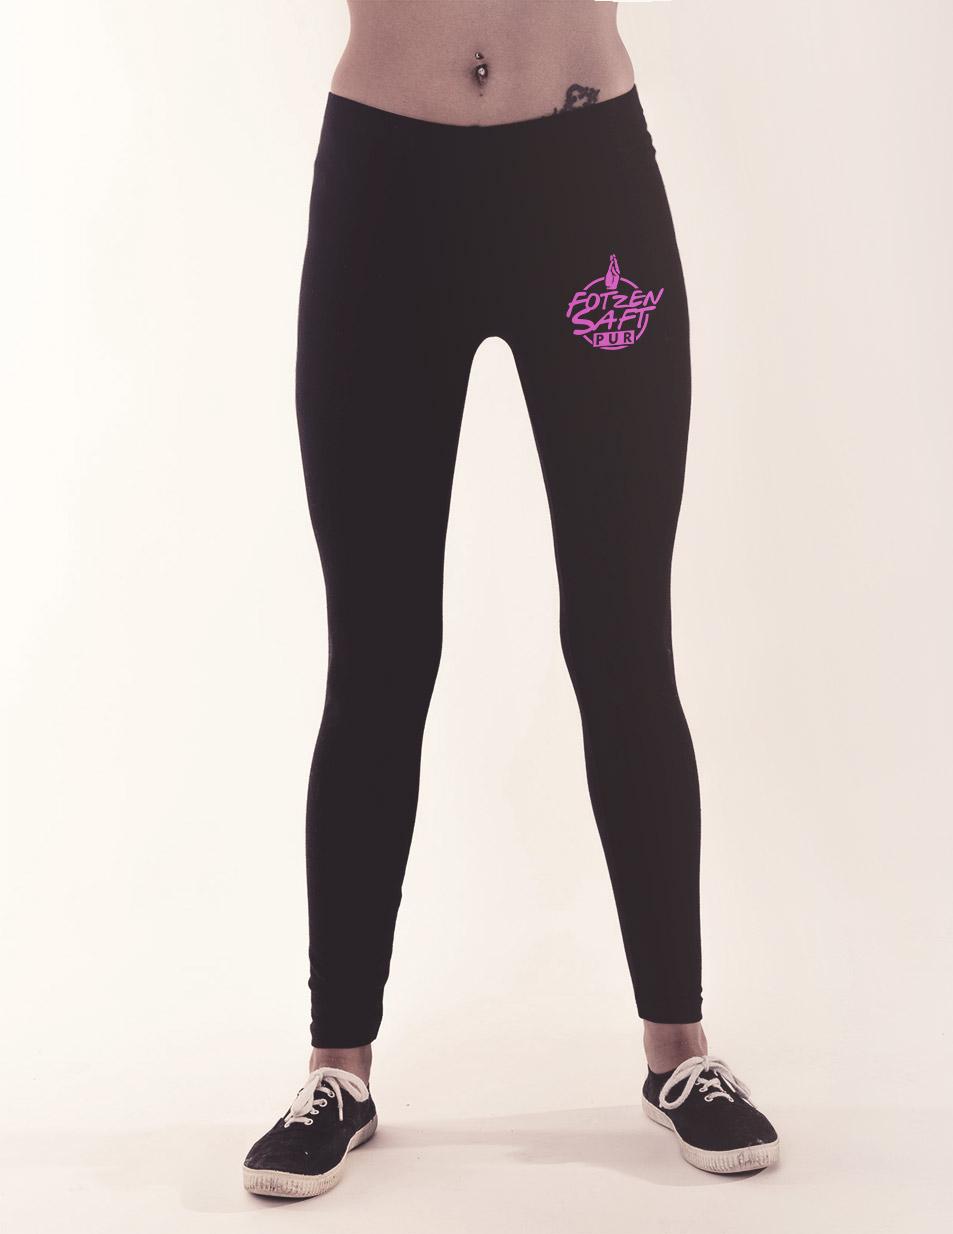 Fotzensaft Leggings pink auf schwarz